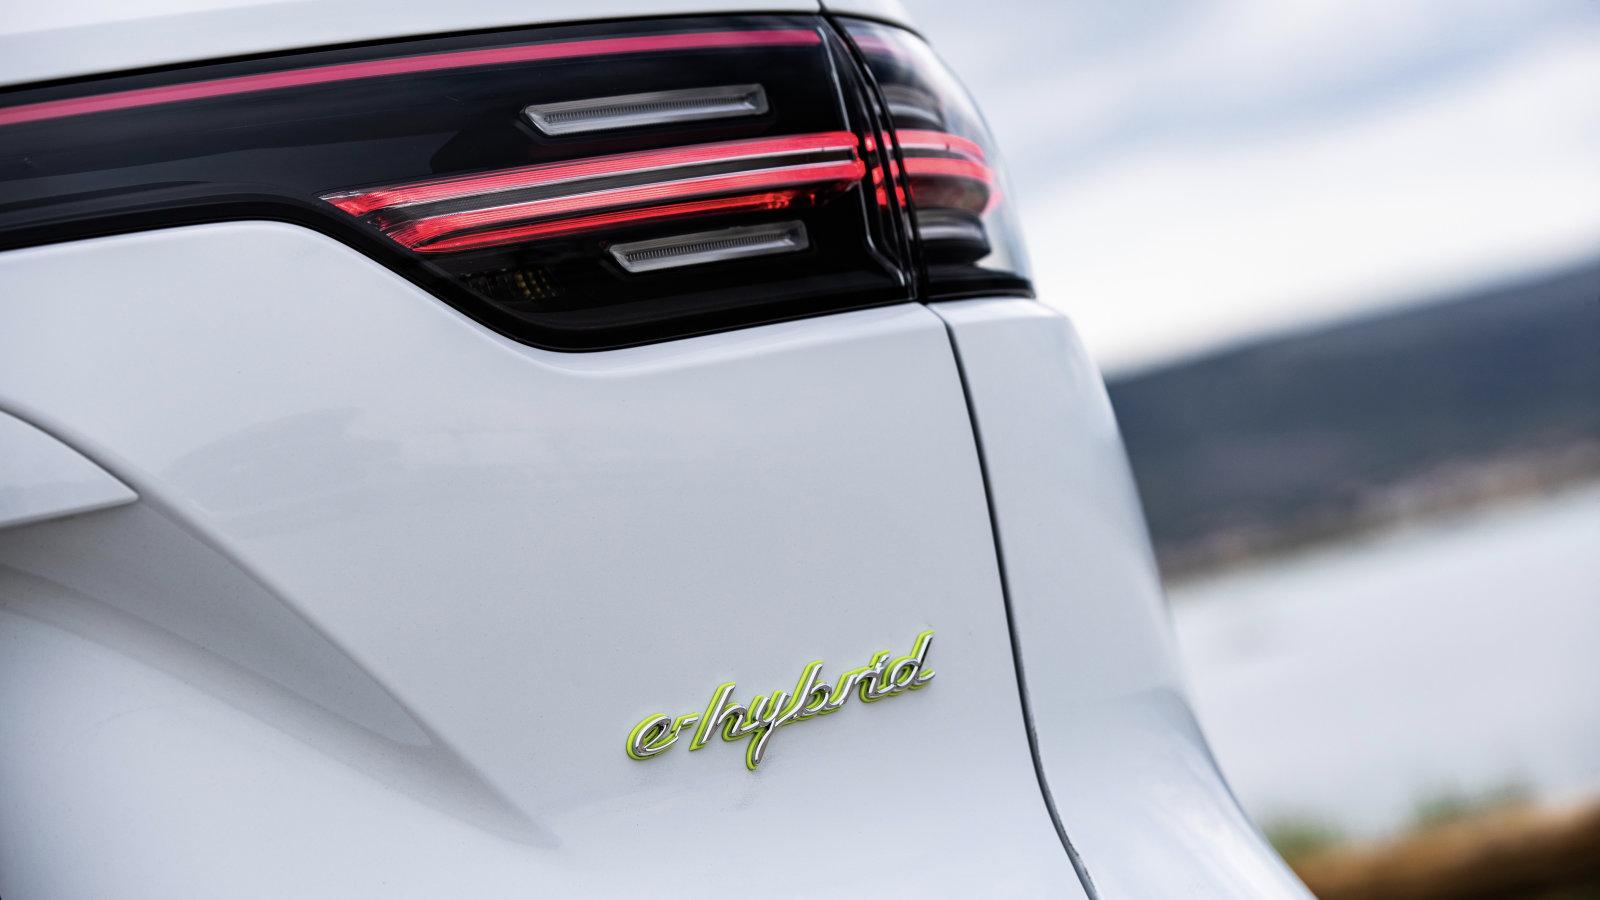 2021 Porsche Cayenne E-Hybrid, Turbo S E-Hybrid gain bigger batteries